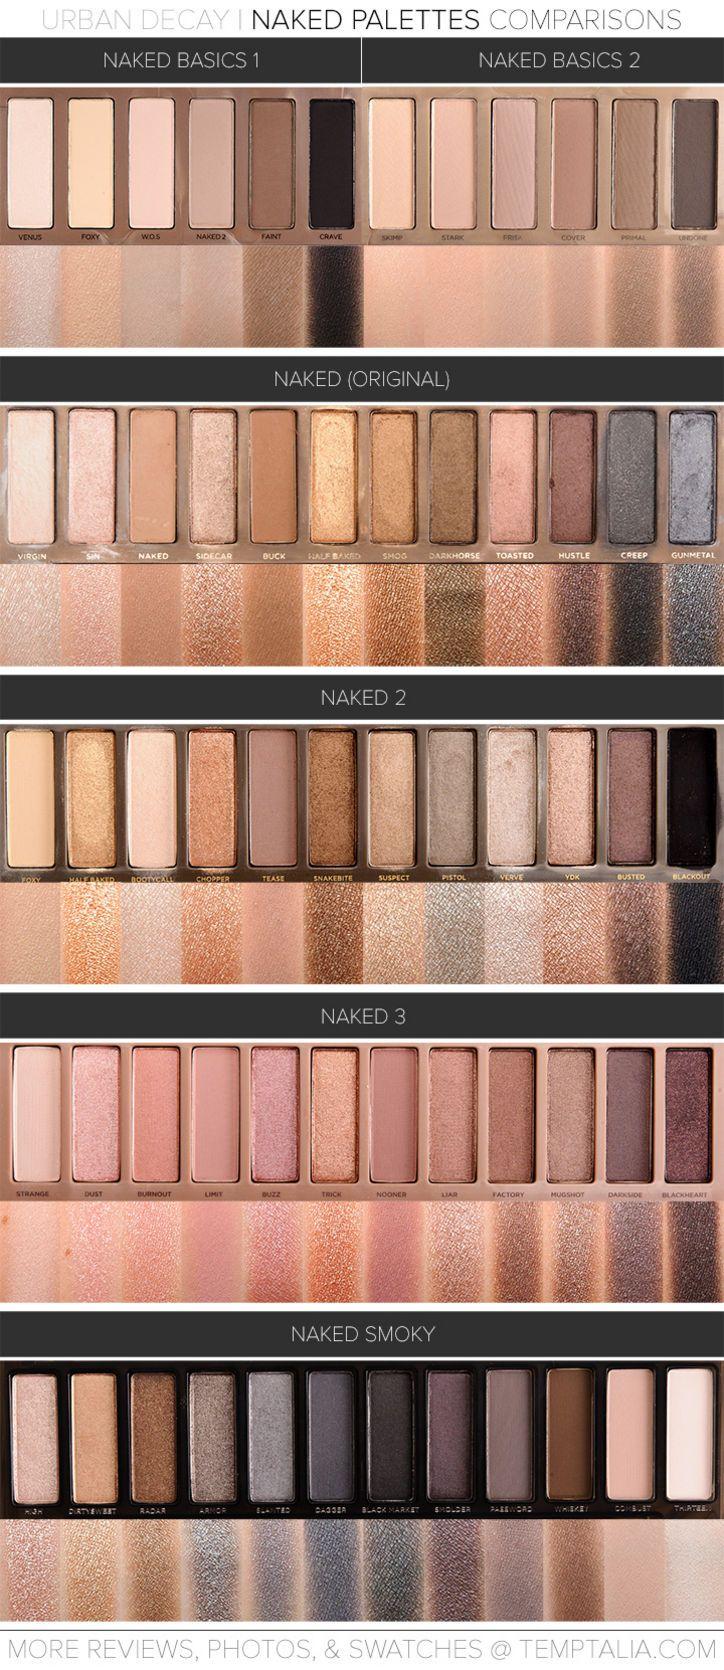 Luscious Lass 40s: Urban Decay Naked Basics 1 & 2 Dupes